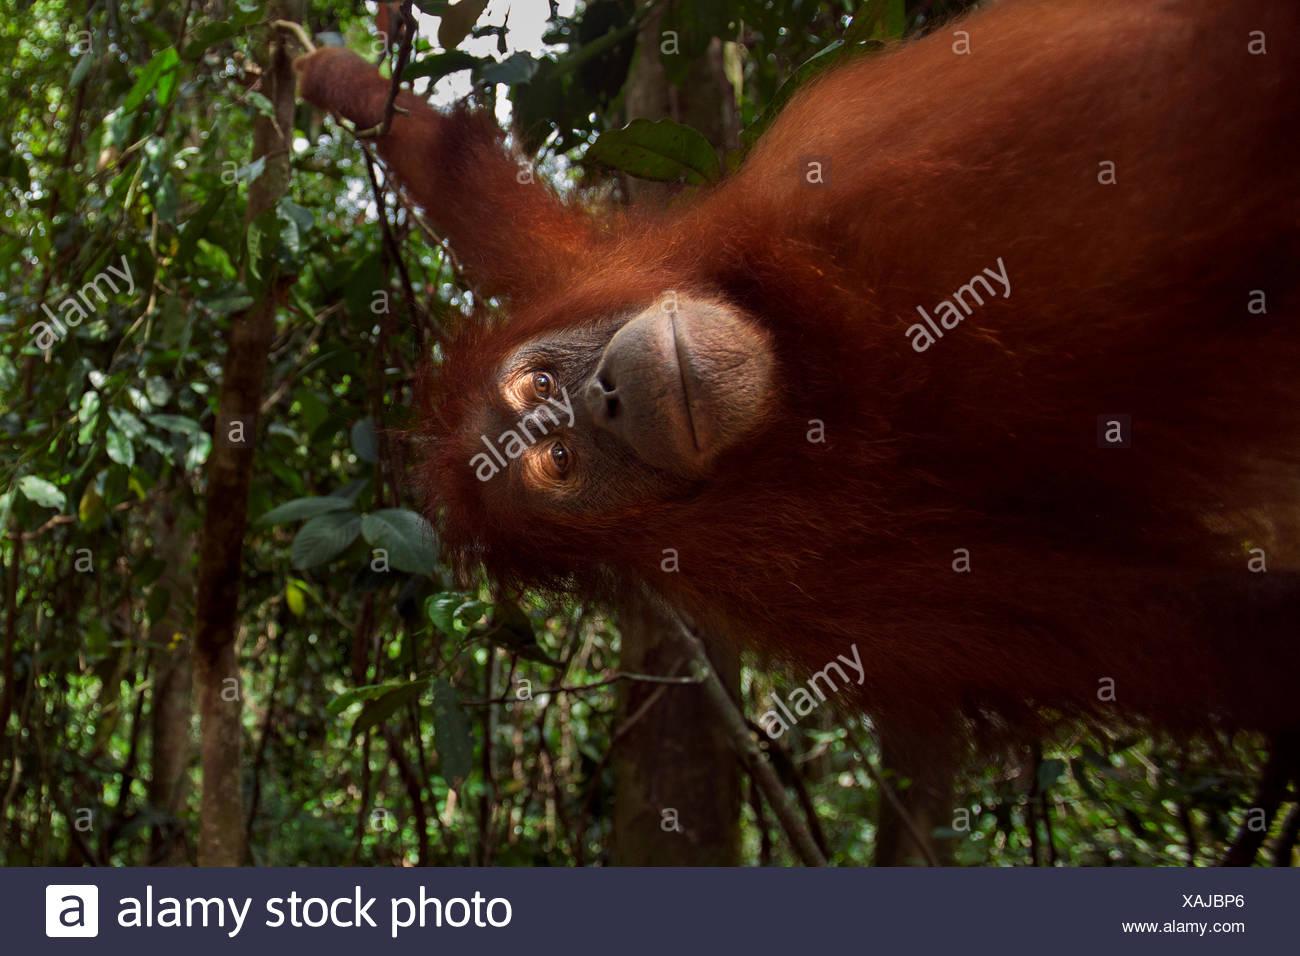 Sumatran orangutan (Pongo abelii) female 'Juni' aged 12 years swinging liana. Gunung Leuser National Park Sumatra Indonesia. Rehabilitated released (or descended those which were released) between 1973 1995. - Stock Image